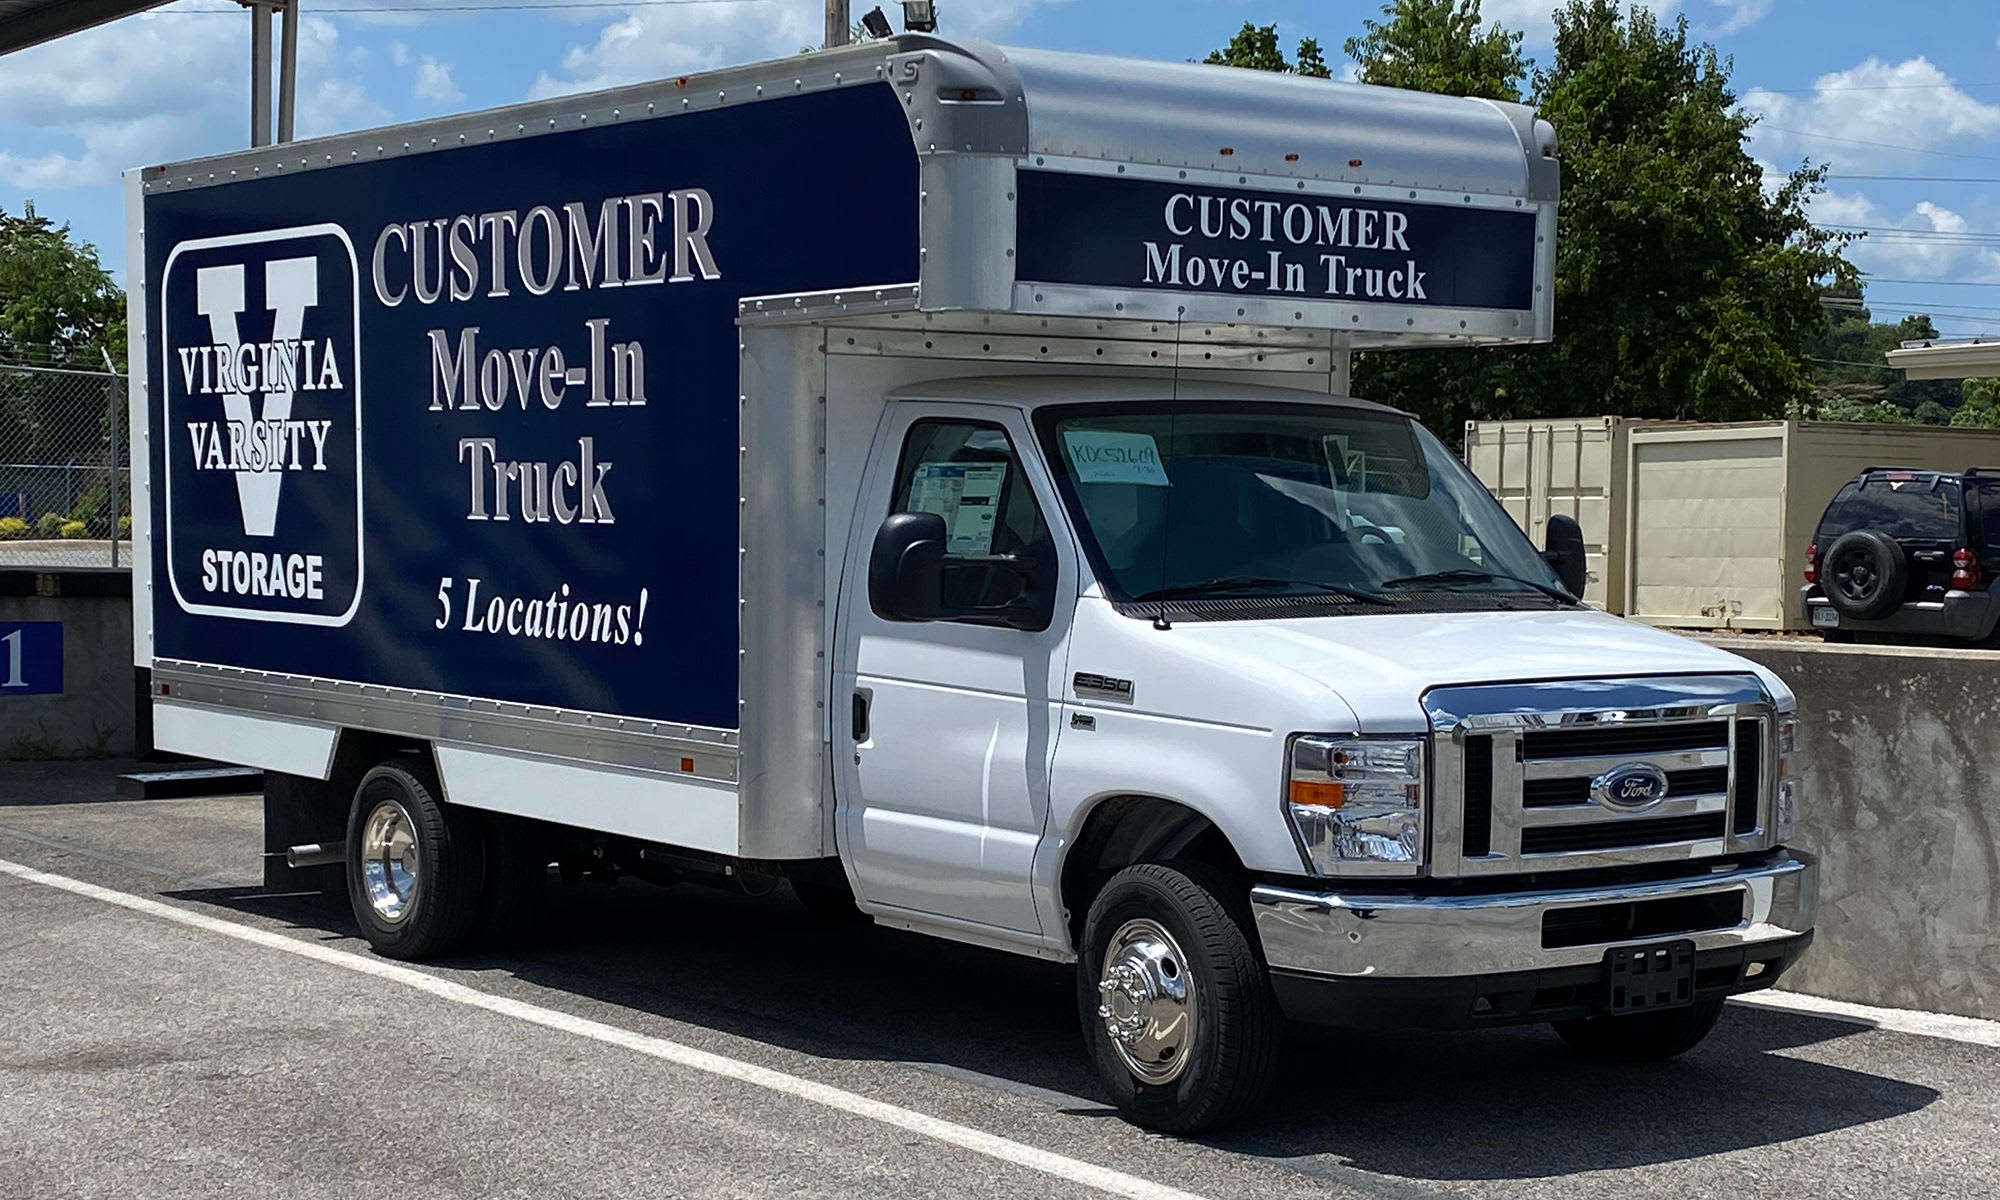 Customer Move-In Truck at Virginia Varsity Storage in Roanoke, Virginia is located